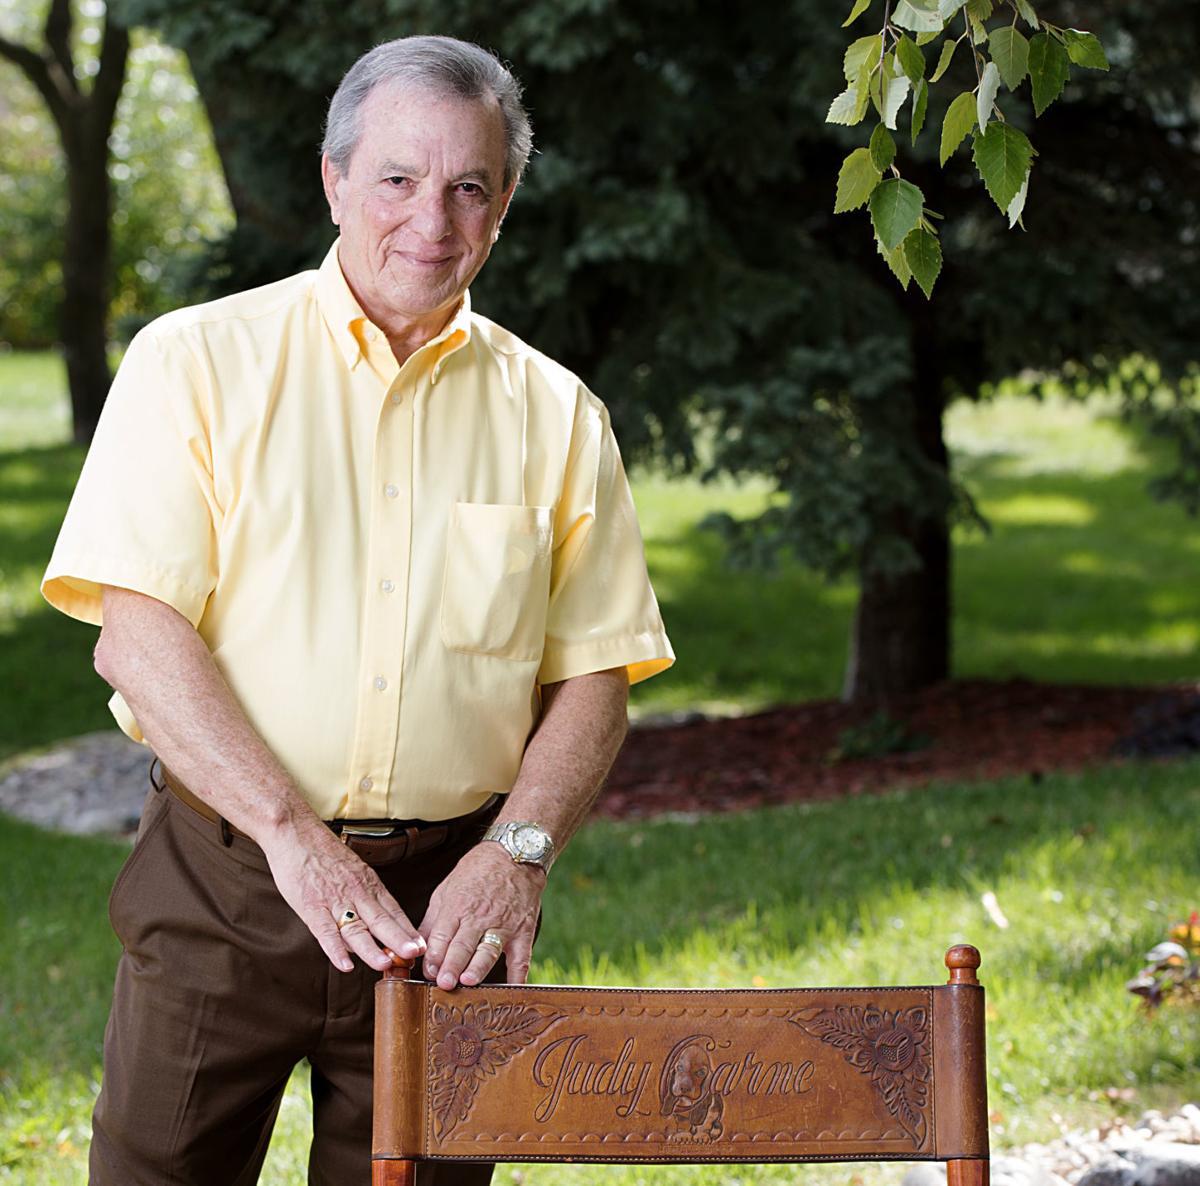 Burt Reynolds chair, 9/19